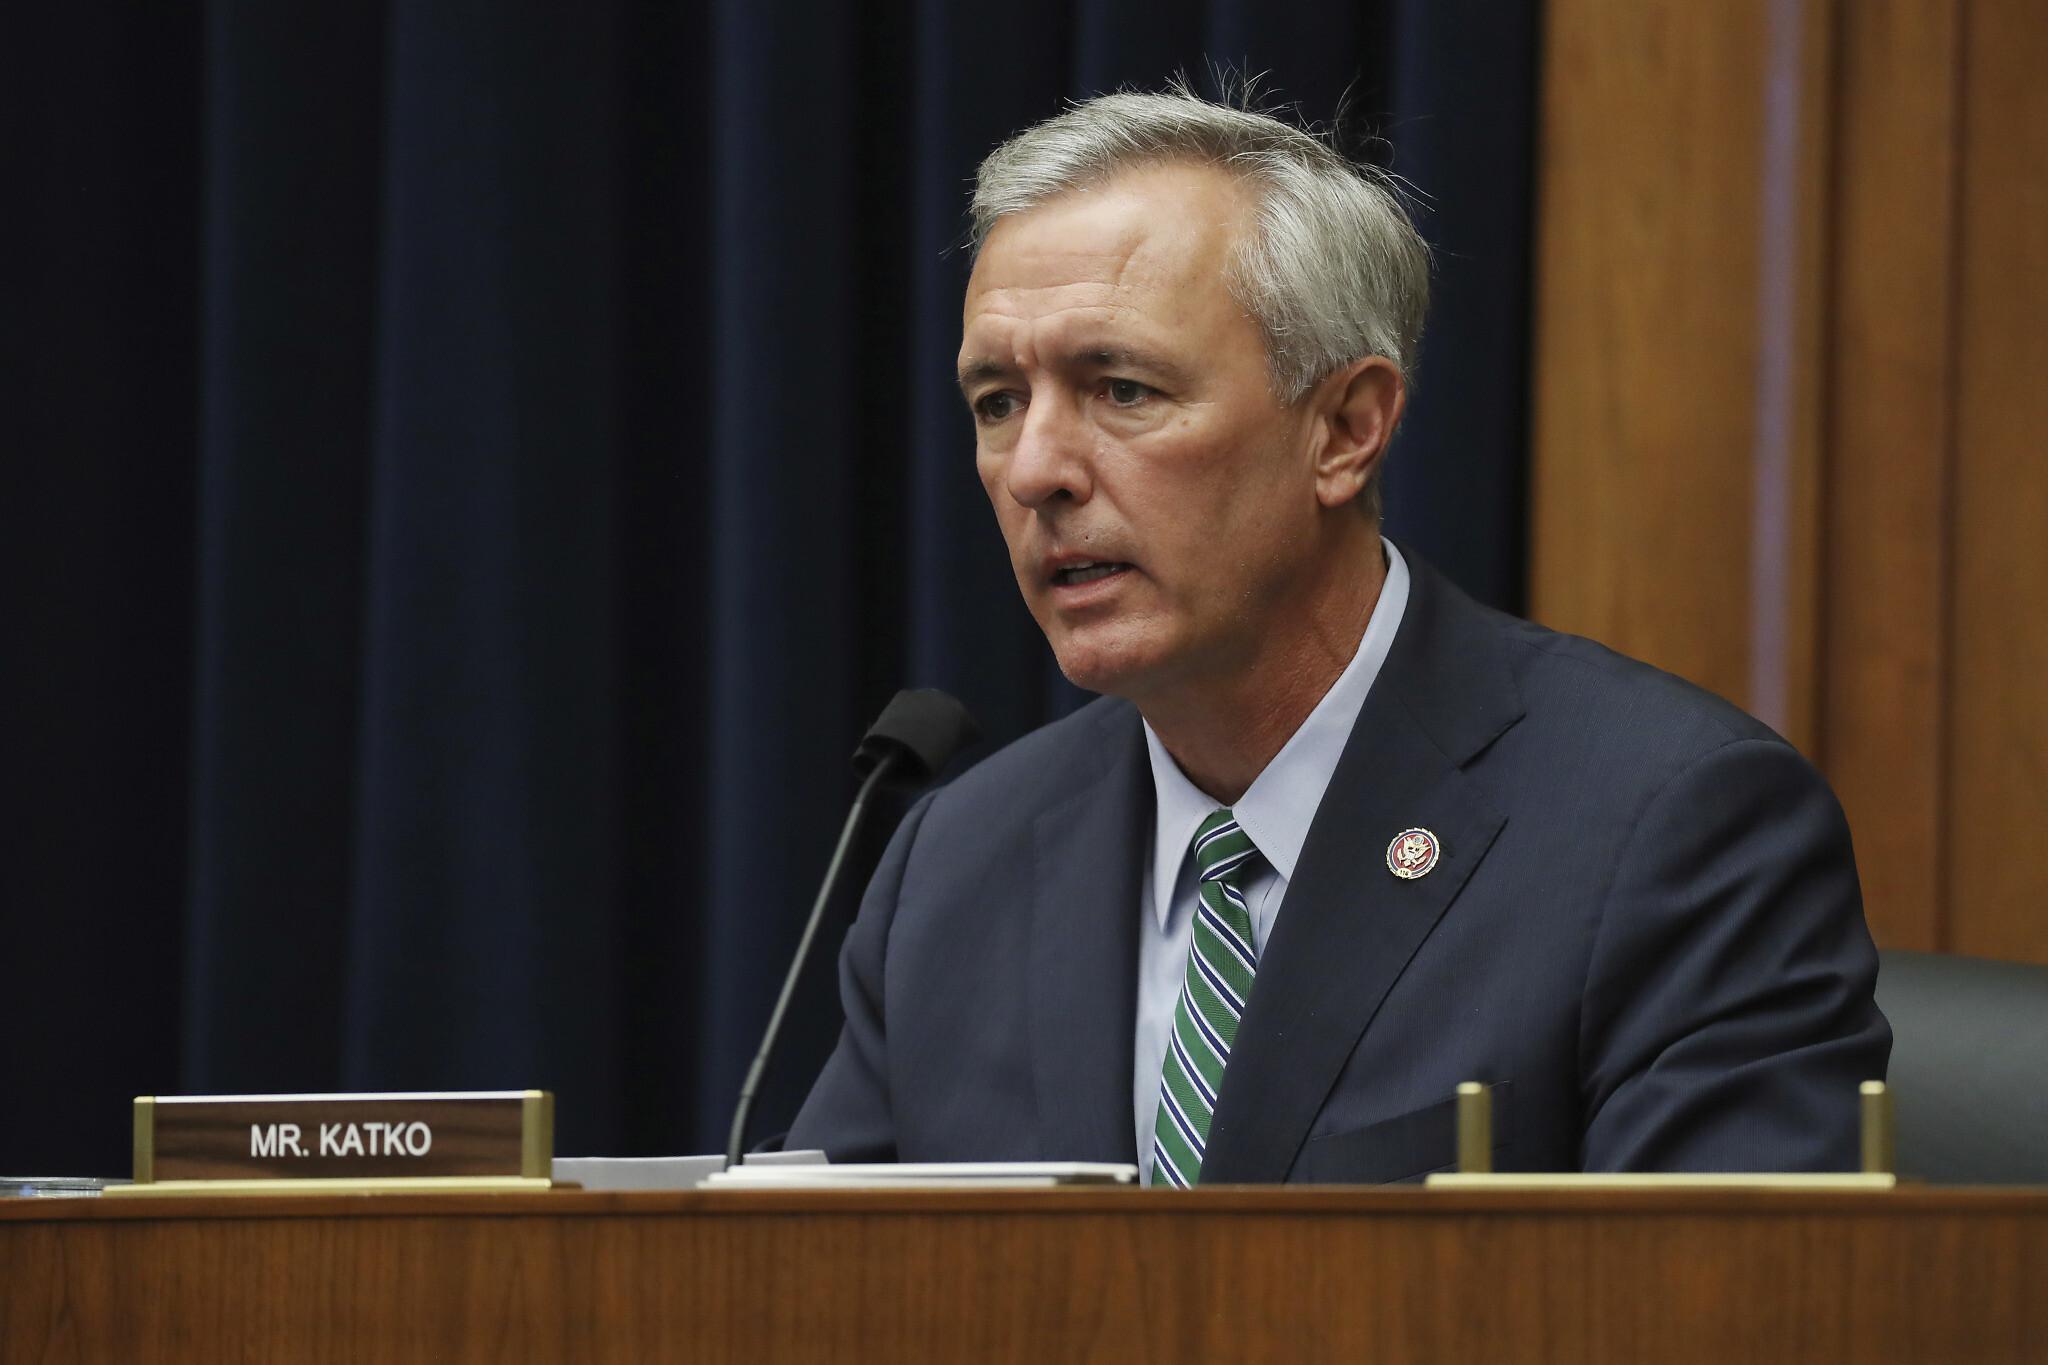 Top Republican senators divided over January 6 commission